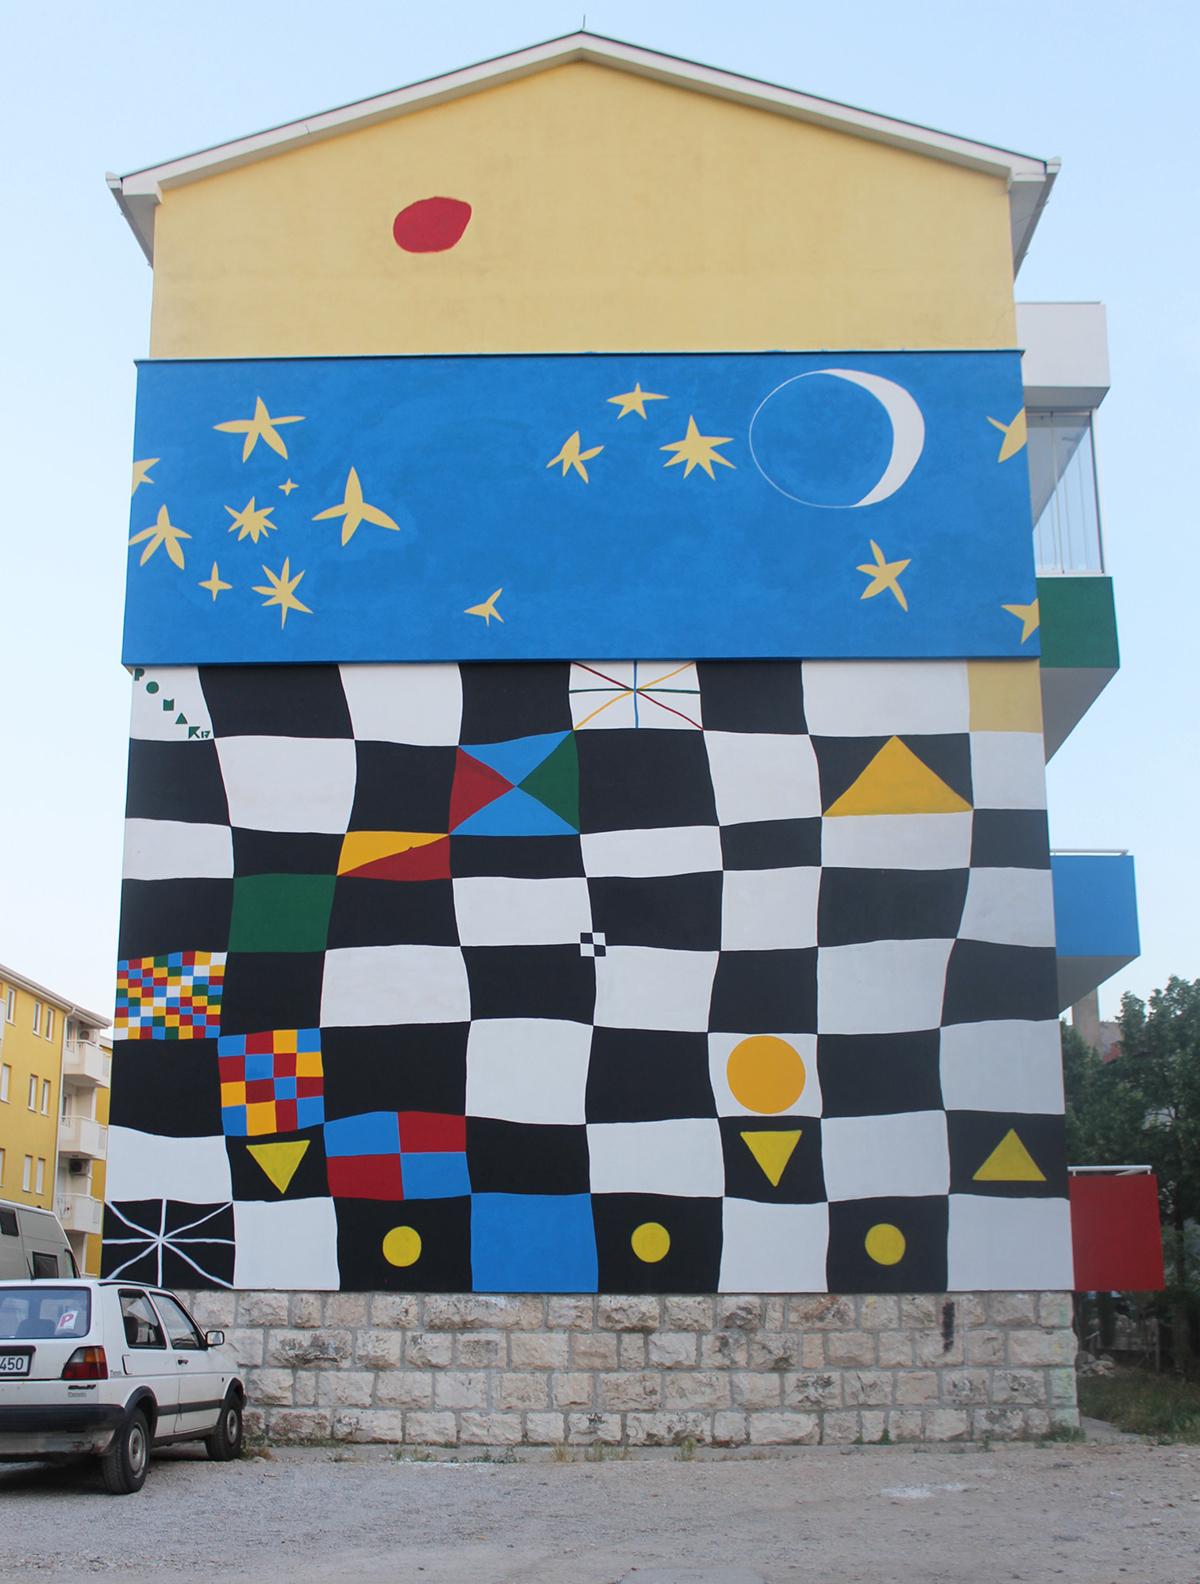 Jorge Pomar Street Art Mostar Bosnia-Herzegovina